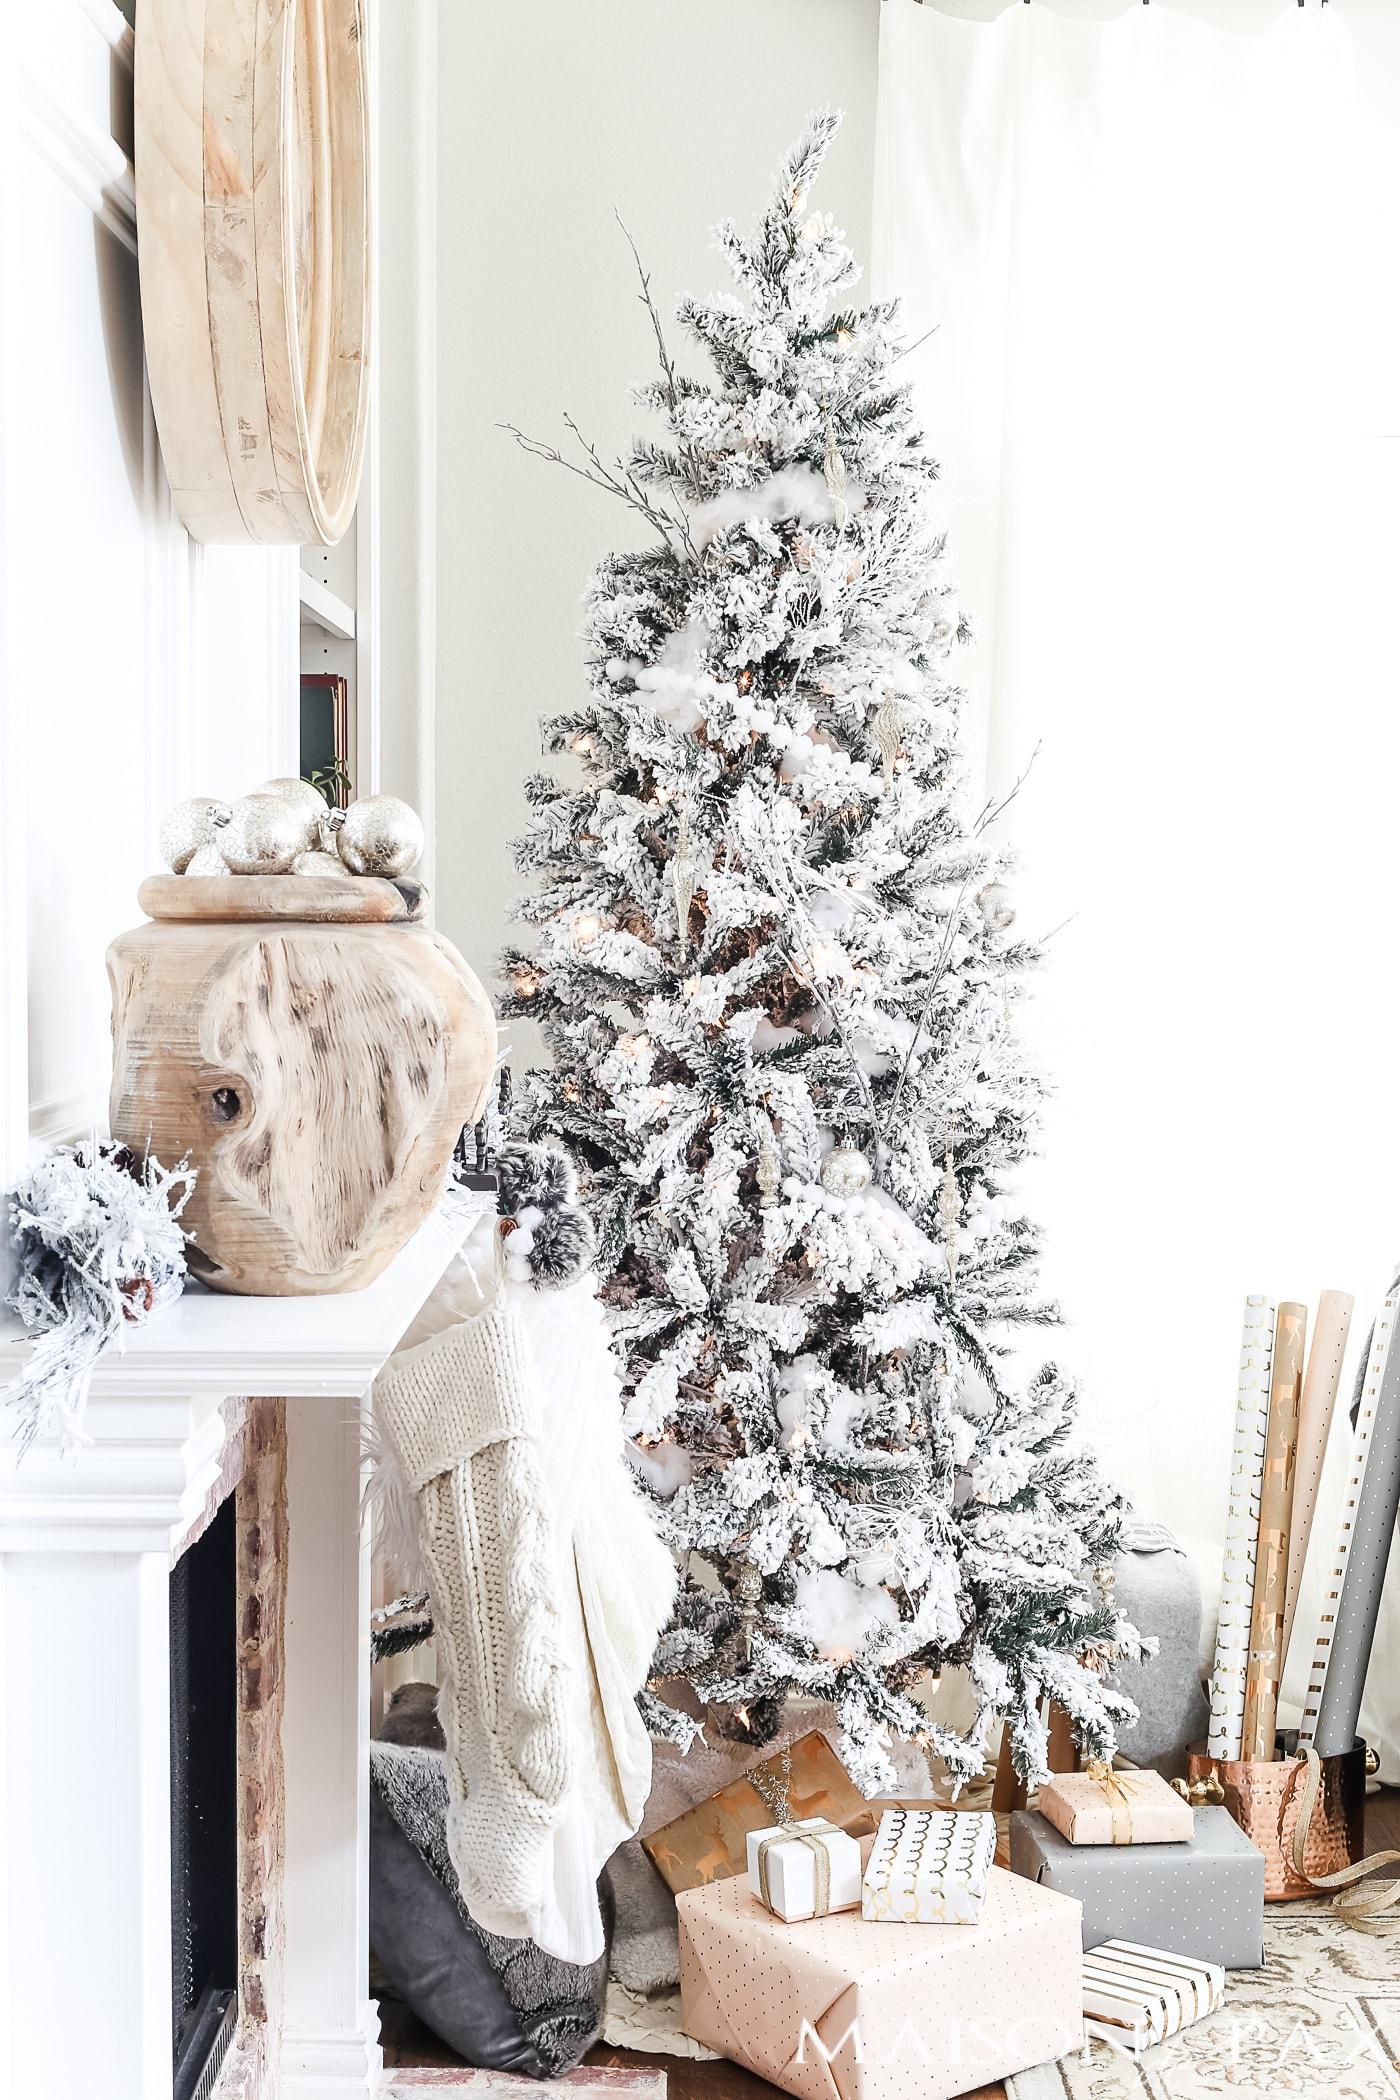 white and cream and blush Christmas decorations: mantel, flocked tree, stockings #neutralChristmasdecor